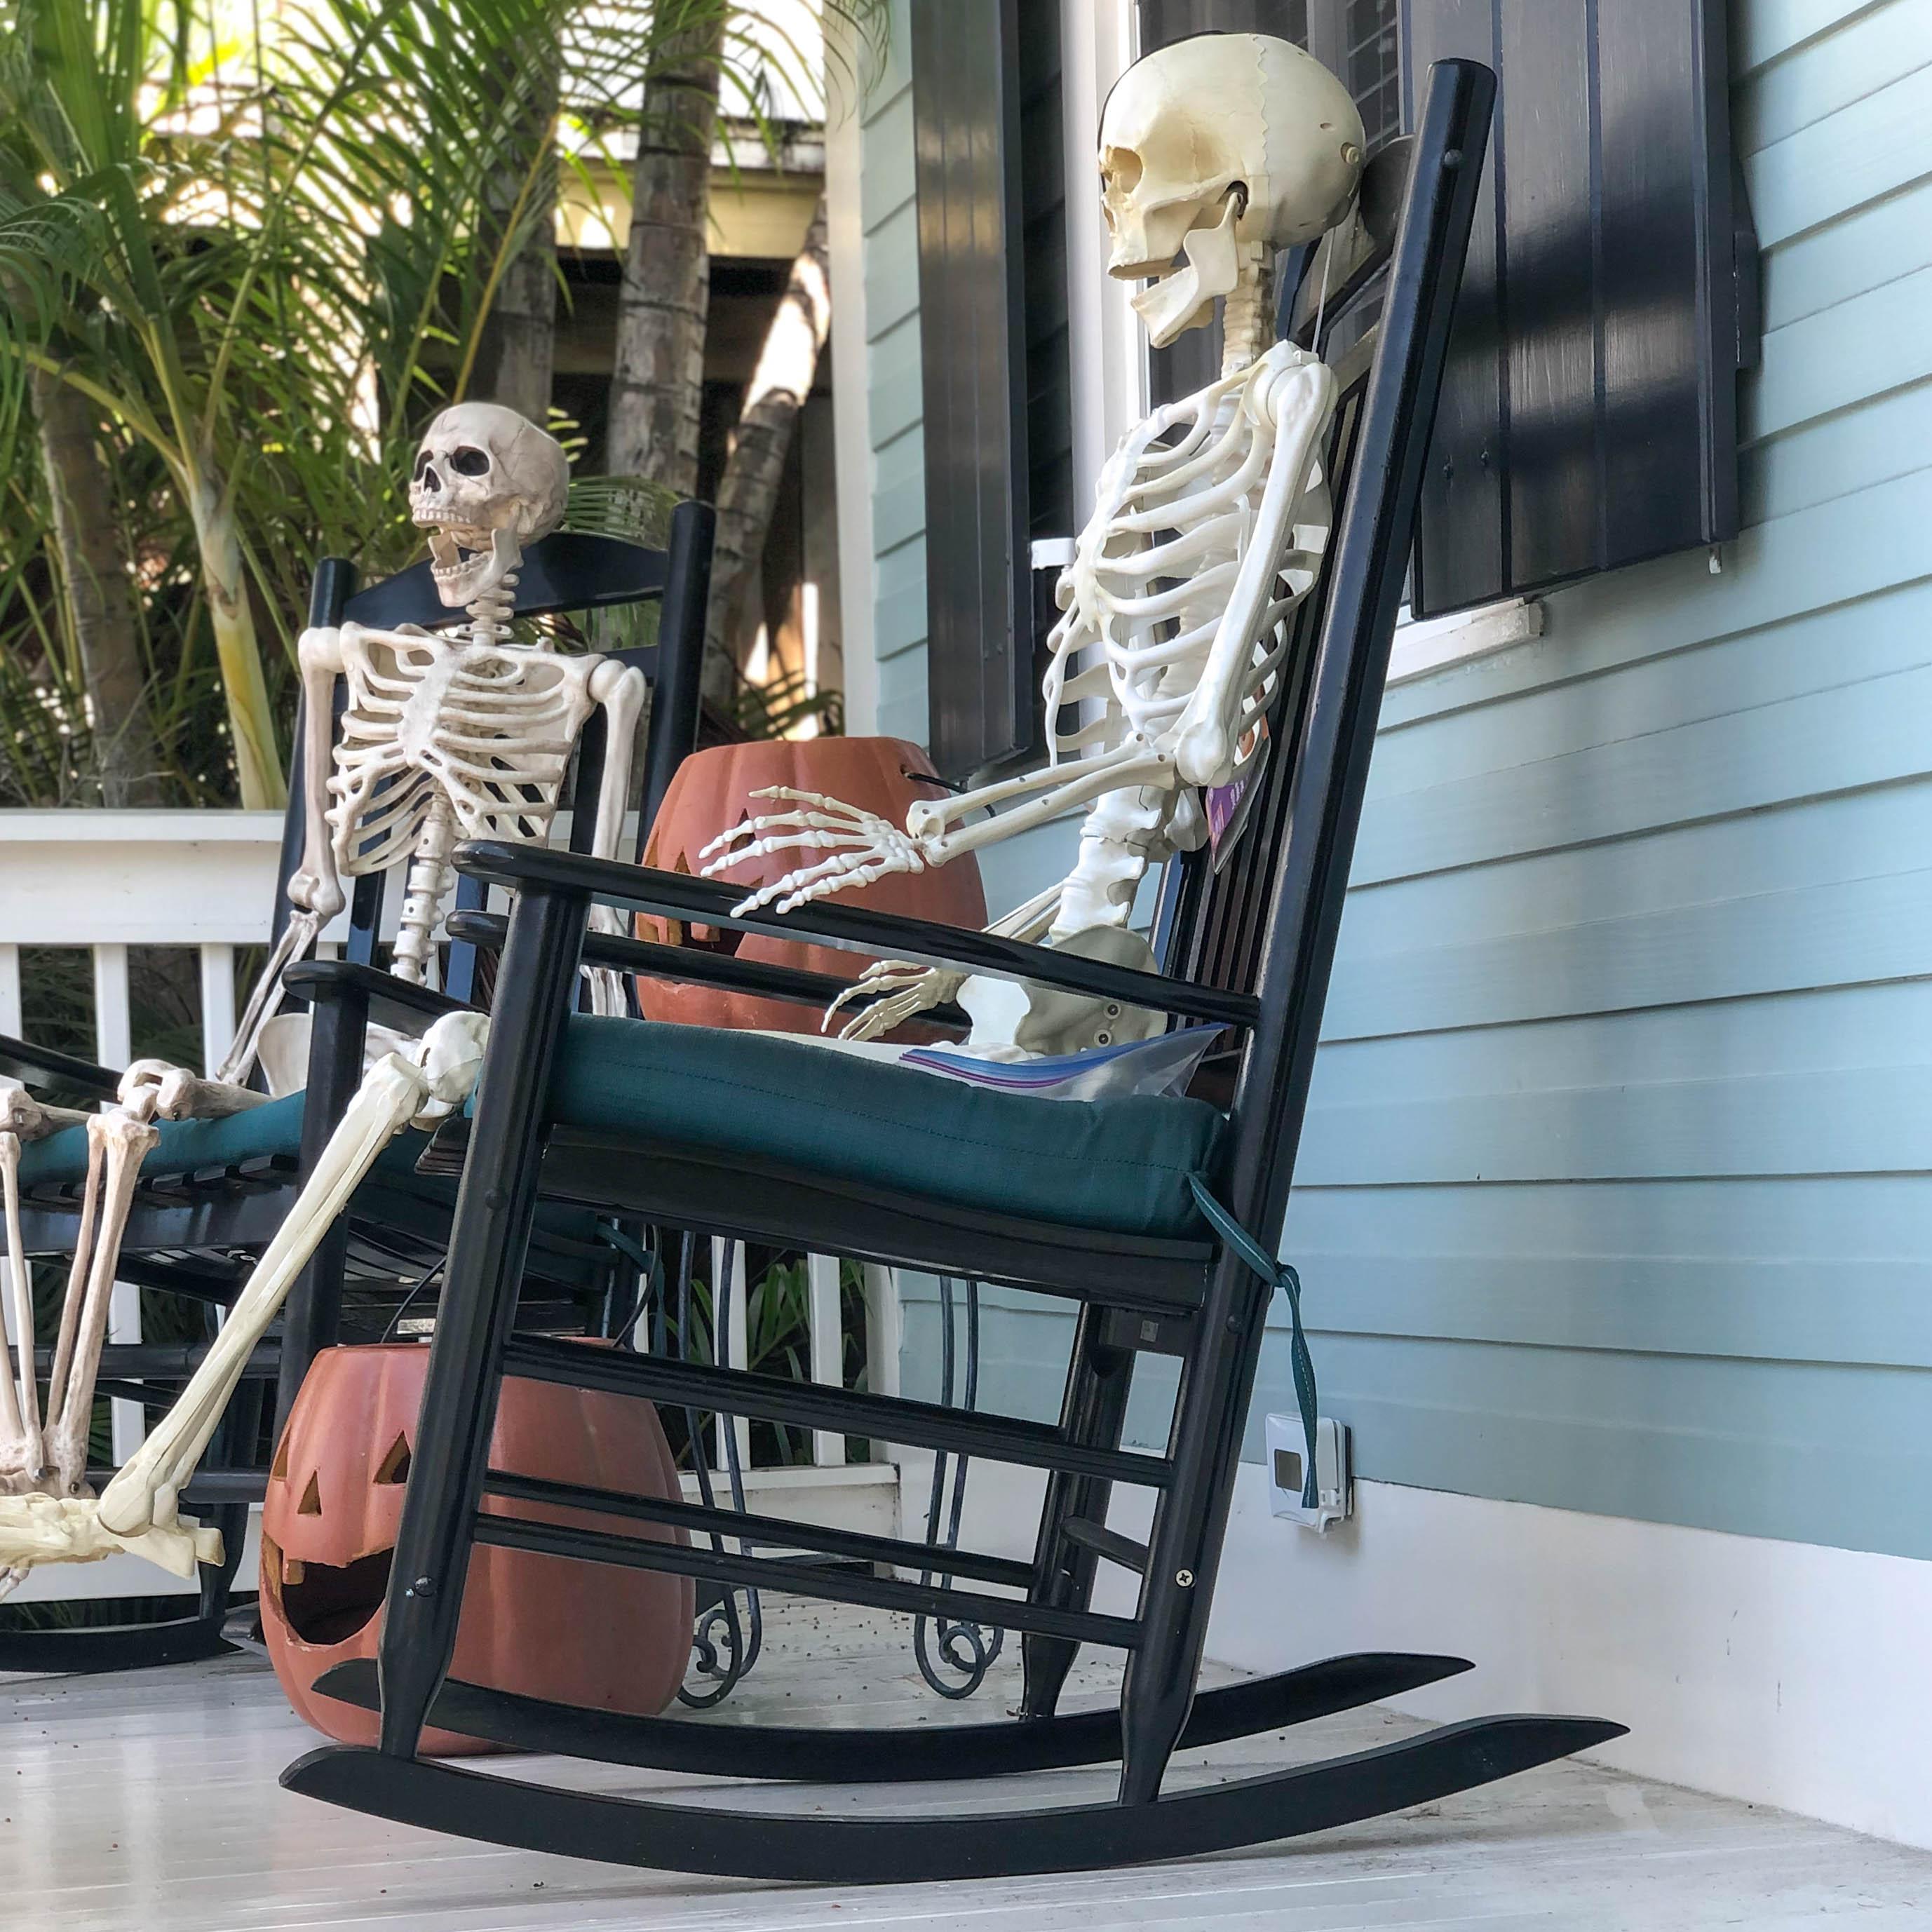 Key West, Florida, Halloween